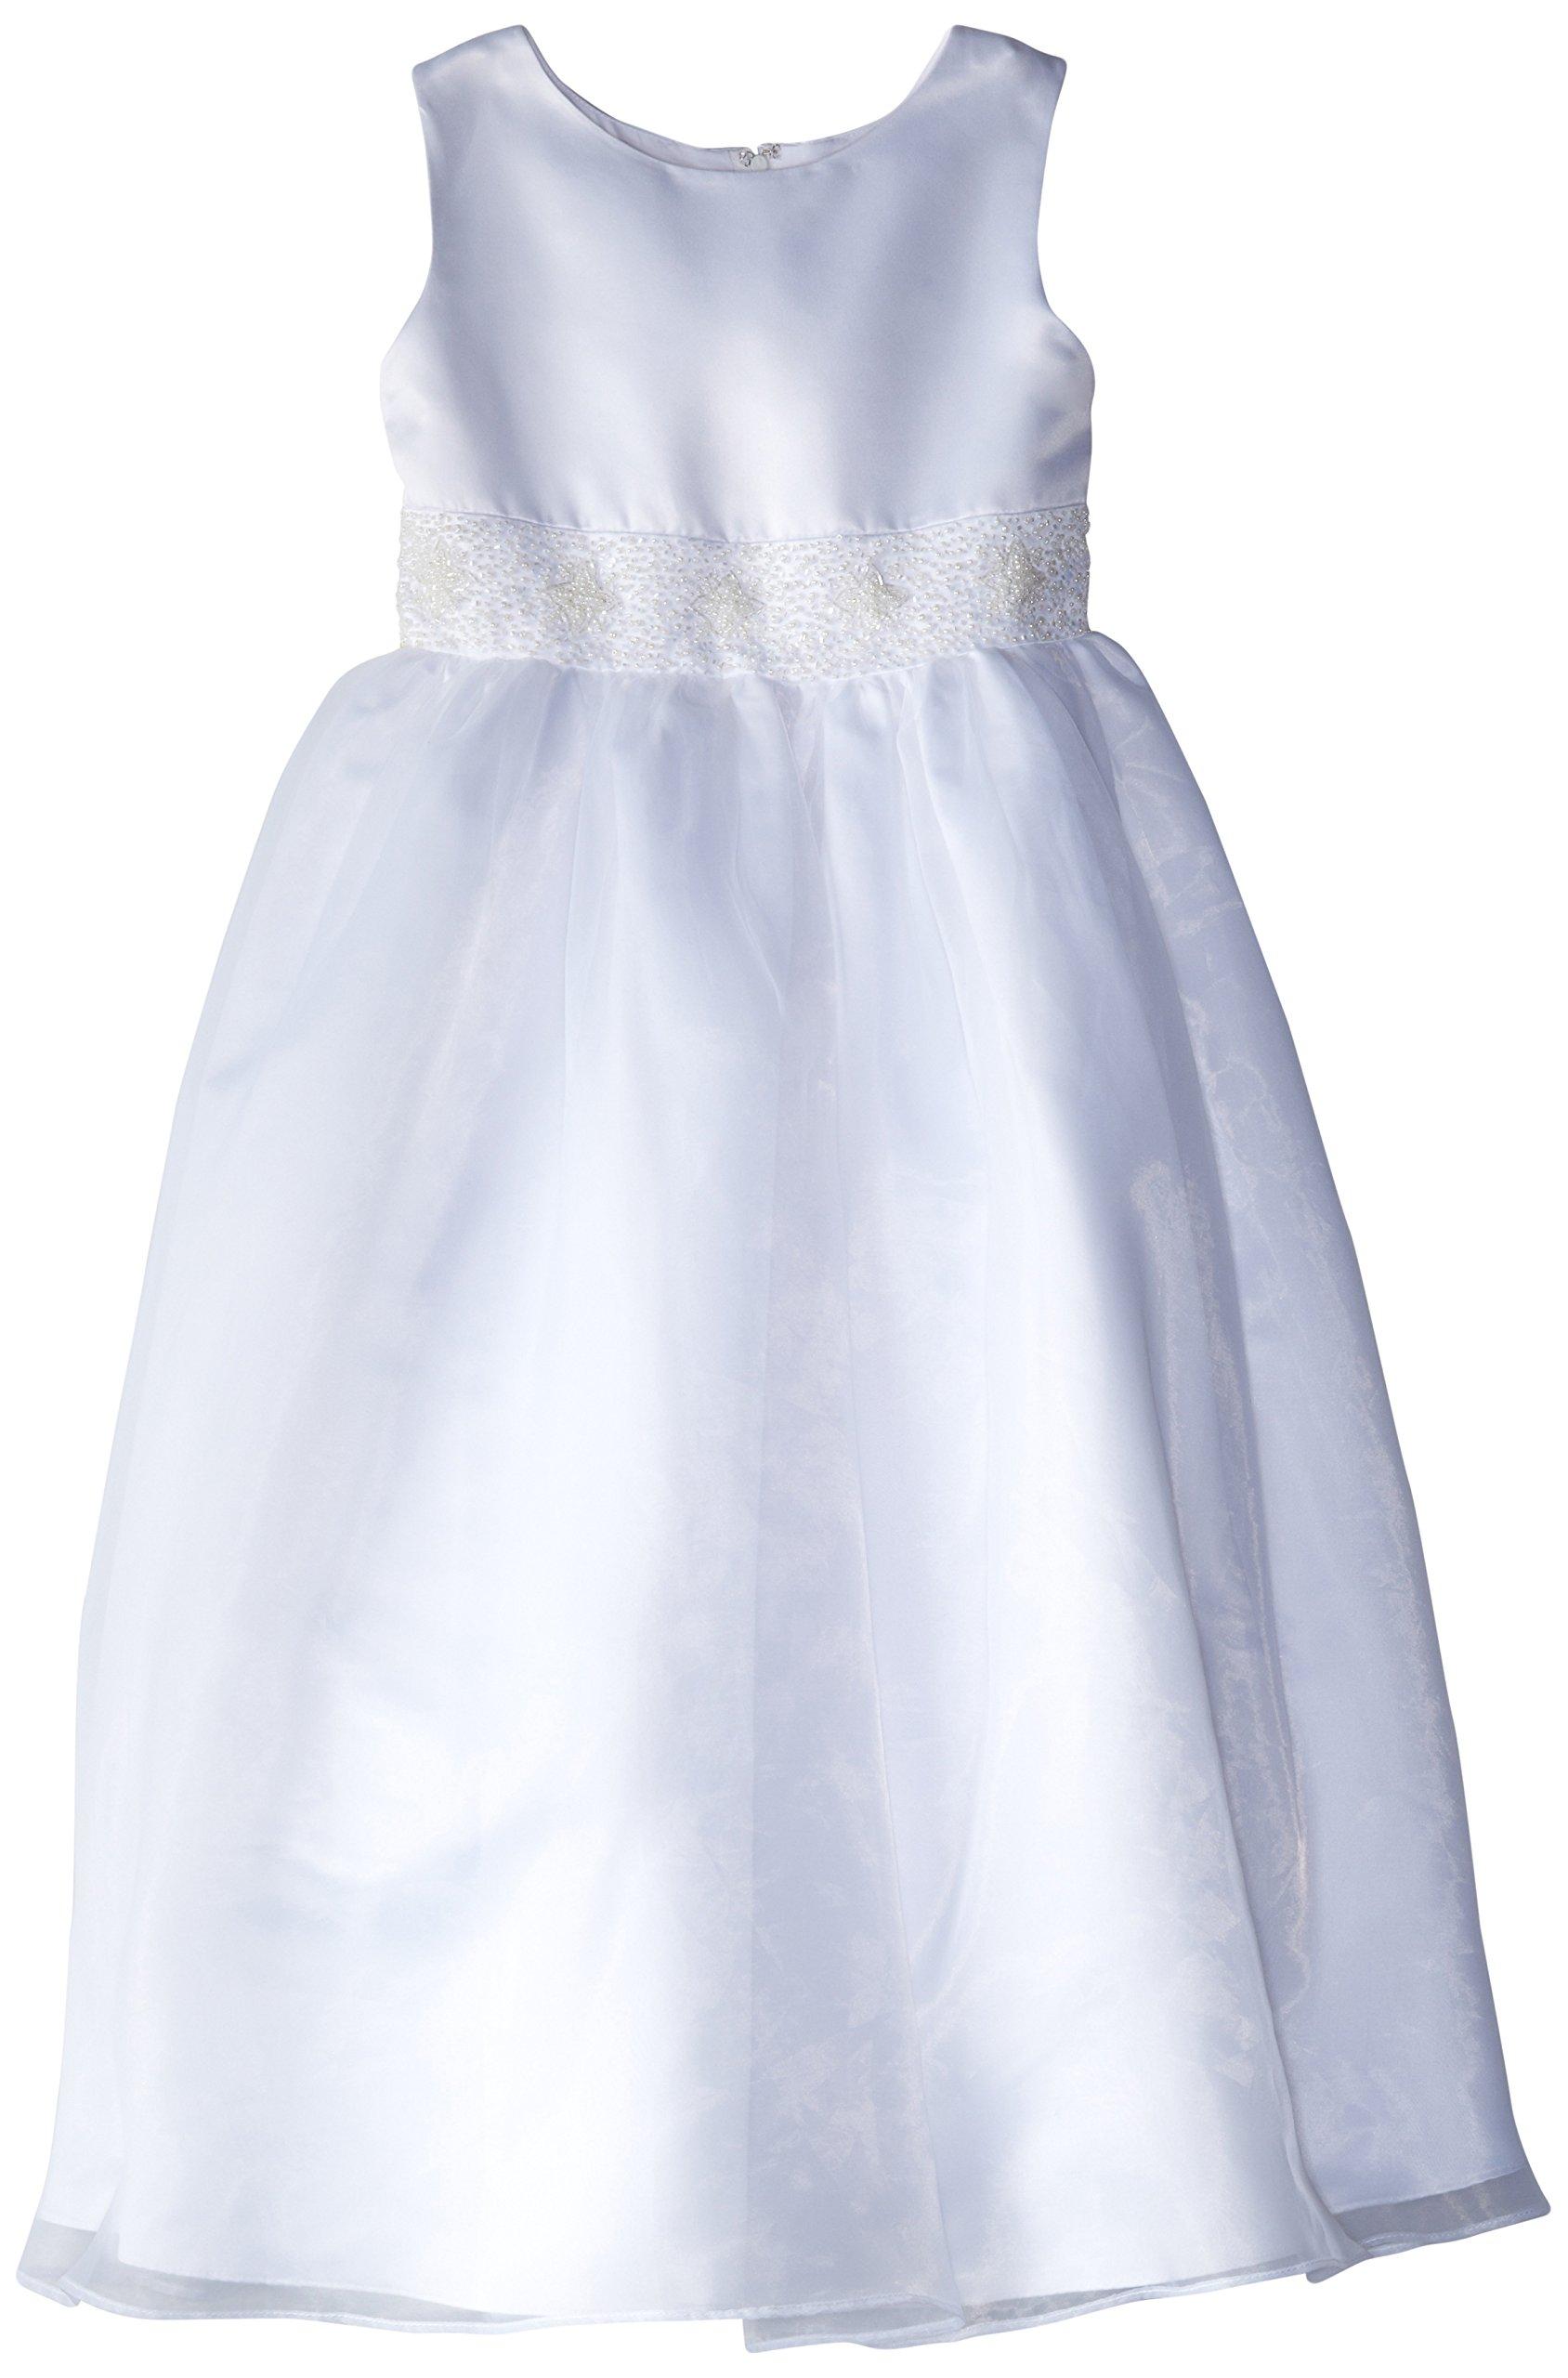 Us Angels Big Girls' Dress With Handbeaded Cummerbund, White, 10